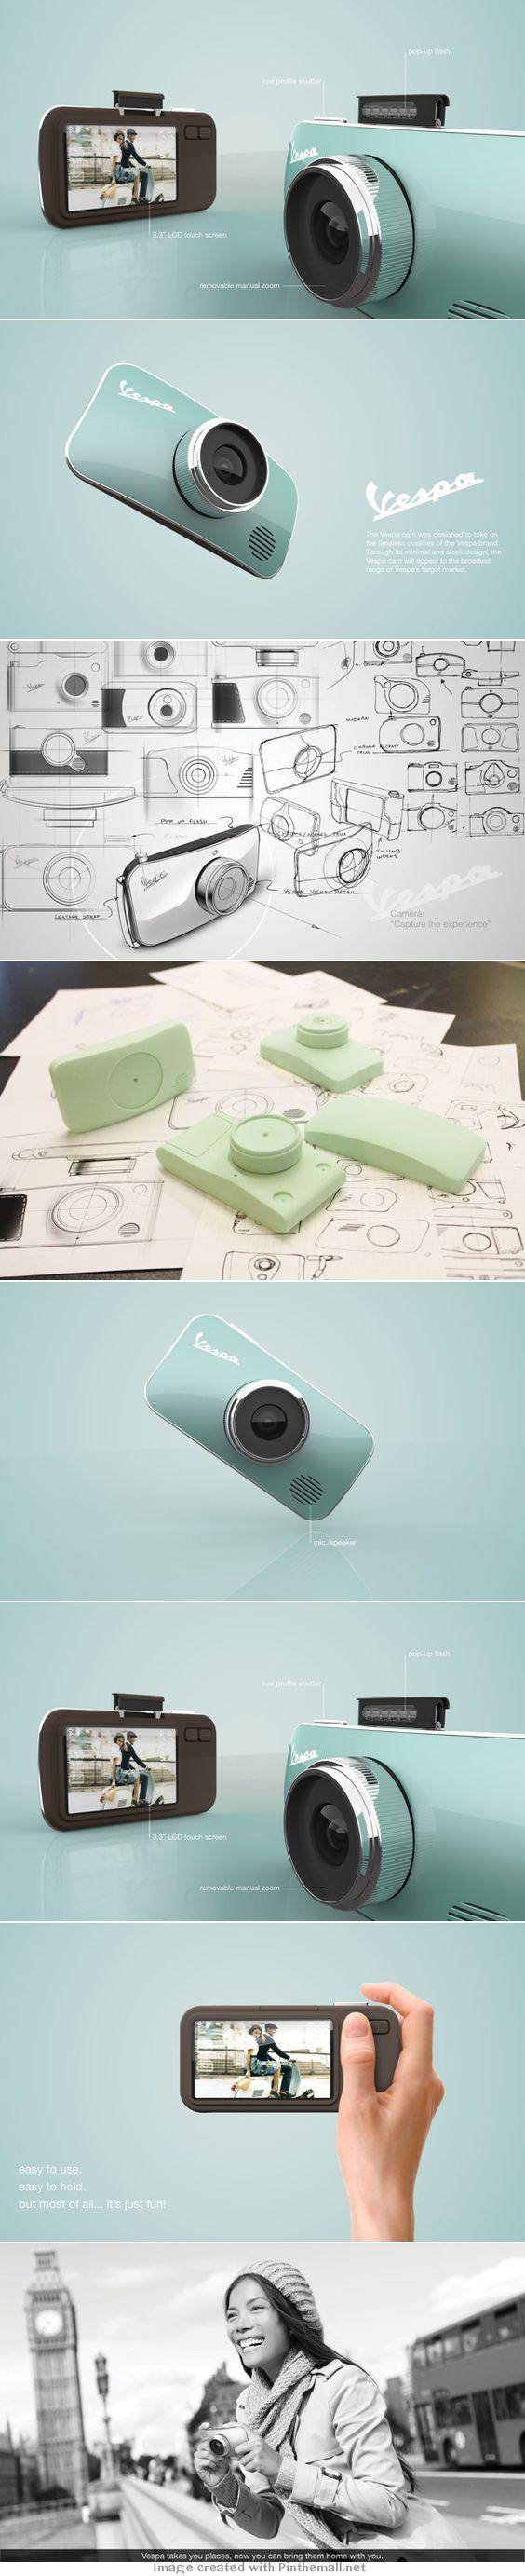 Vespa Camera Product Design Project Raddest Men 39 S